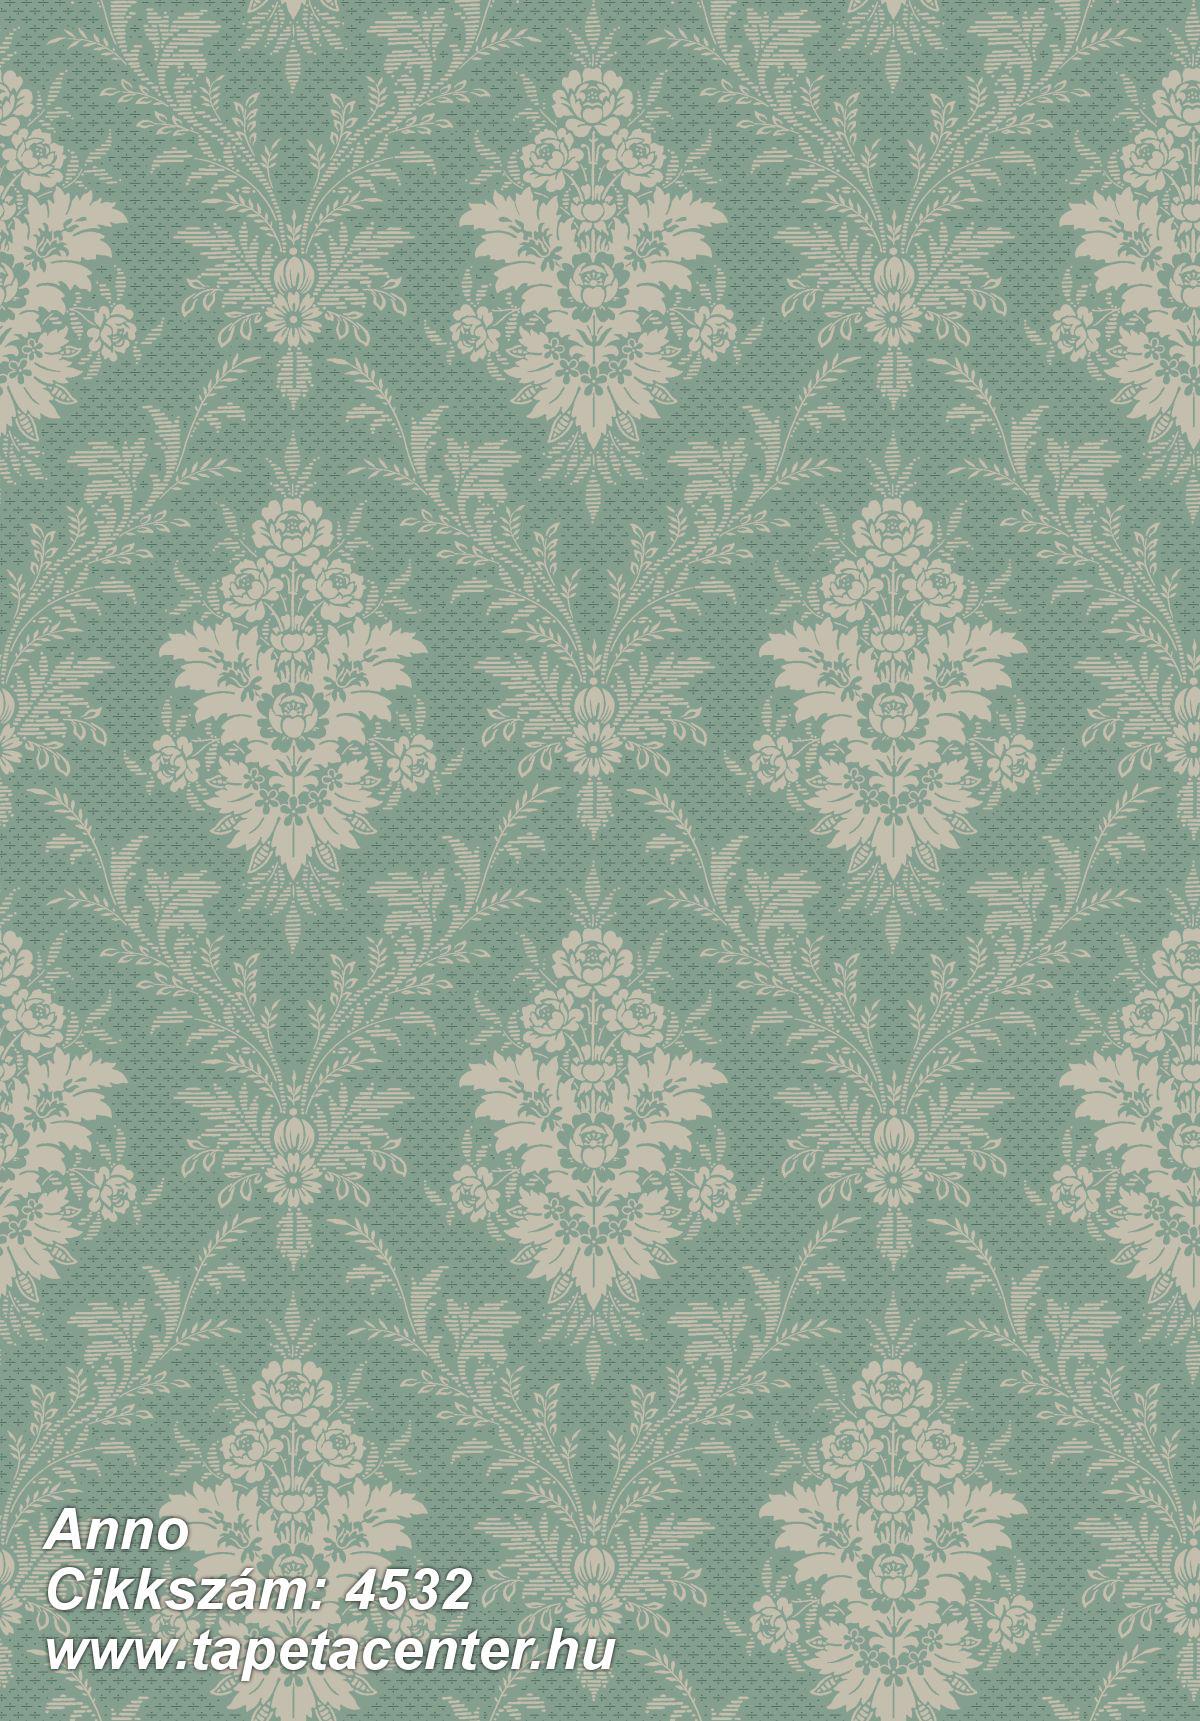 Barokk-klasszikus,bézs-drapp,vajszín,zöld,lemosható,vlies tapéta